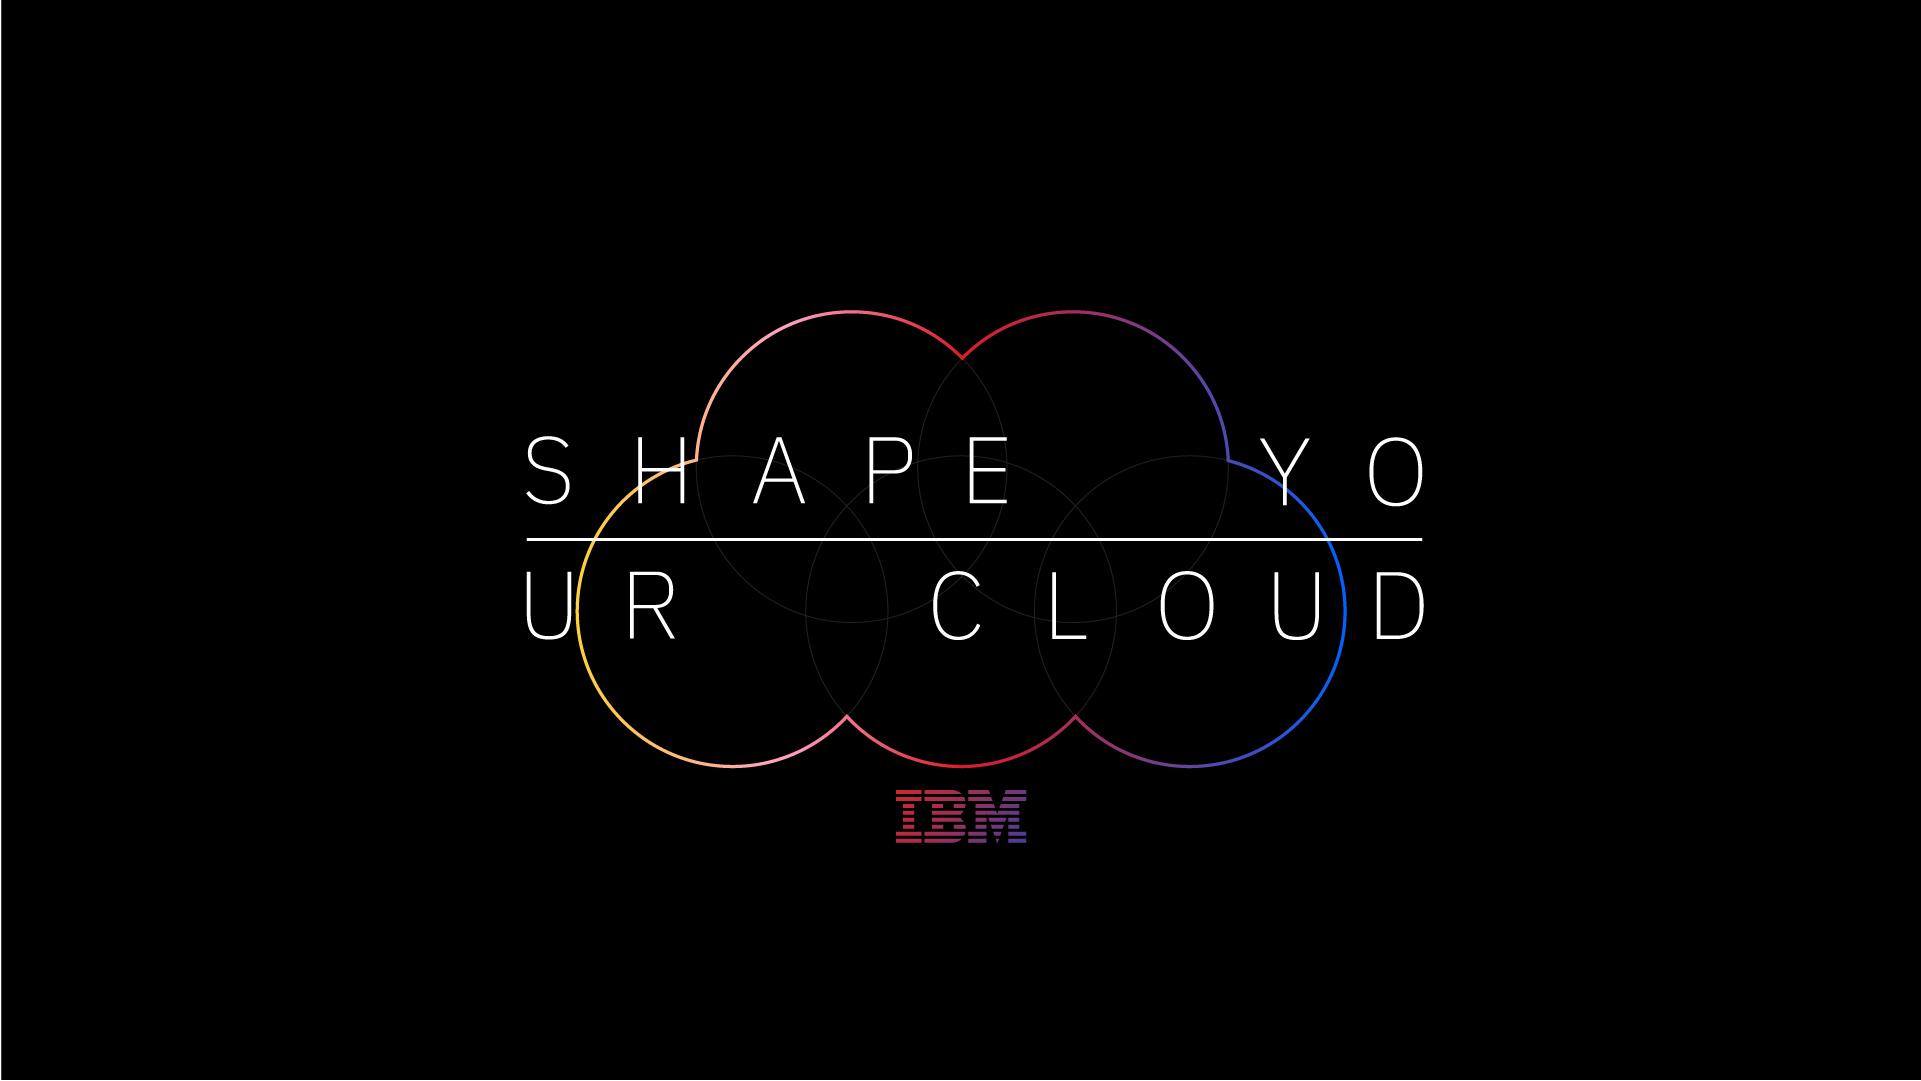 IBM_SHAPE-YOUR-CLOUD_DC_EDITS_BH_proceso_IBM-process-5.jpg